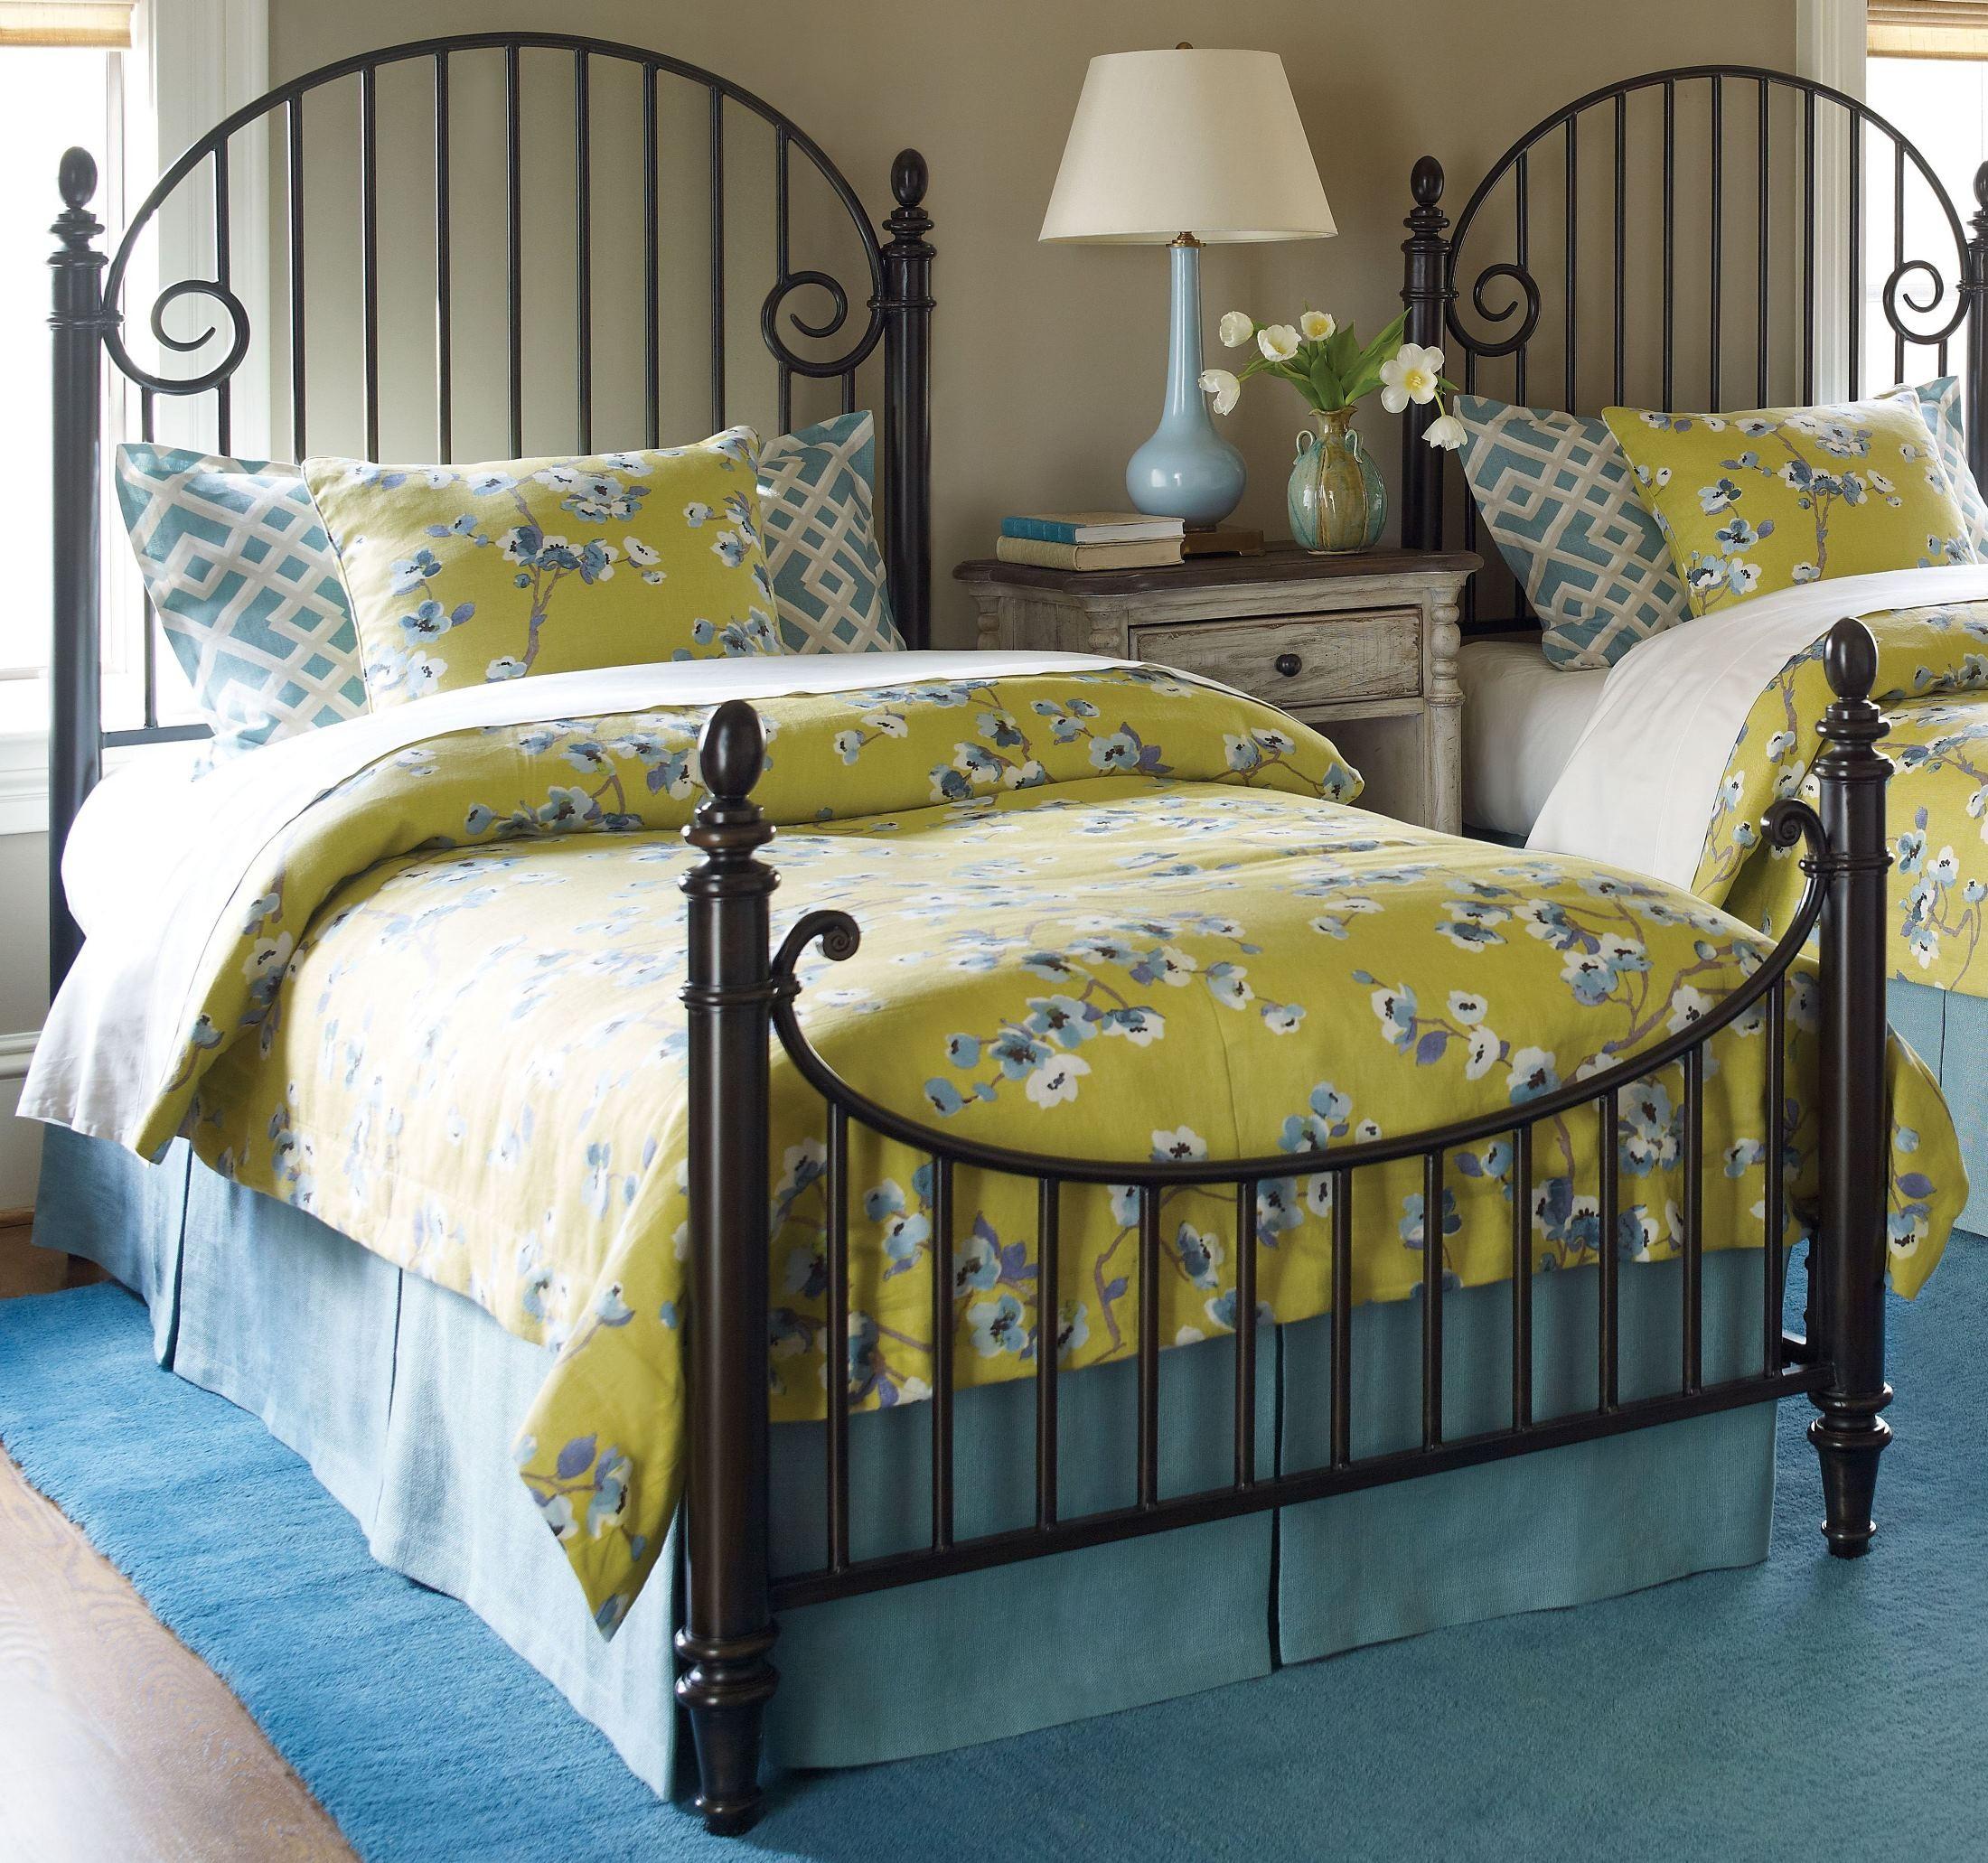 Weatherford cornsilk catlins metal bedroom set from for Kincaid american journal bedroom furniture